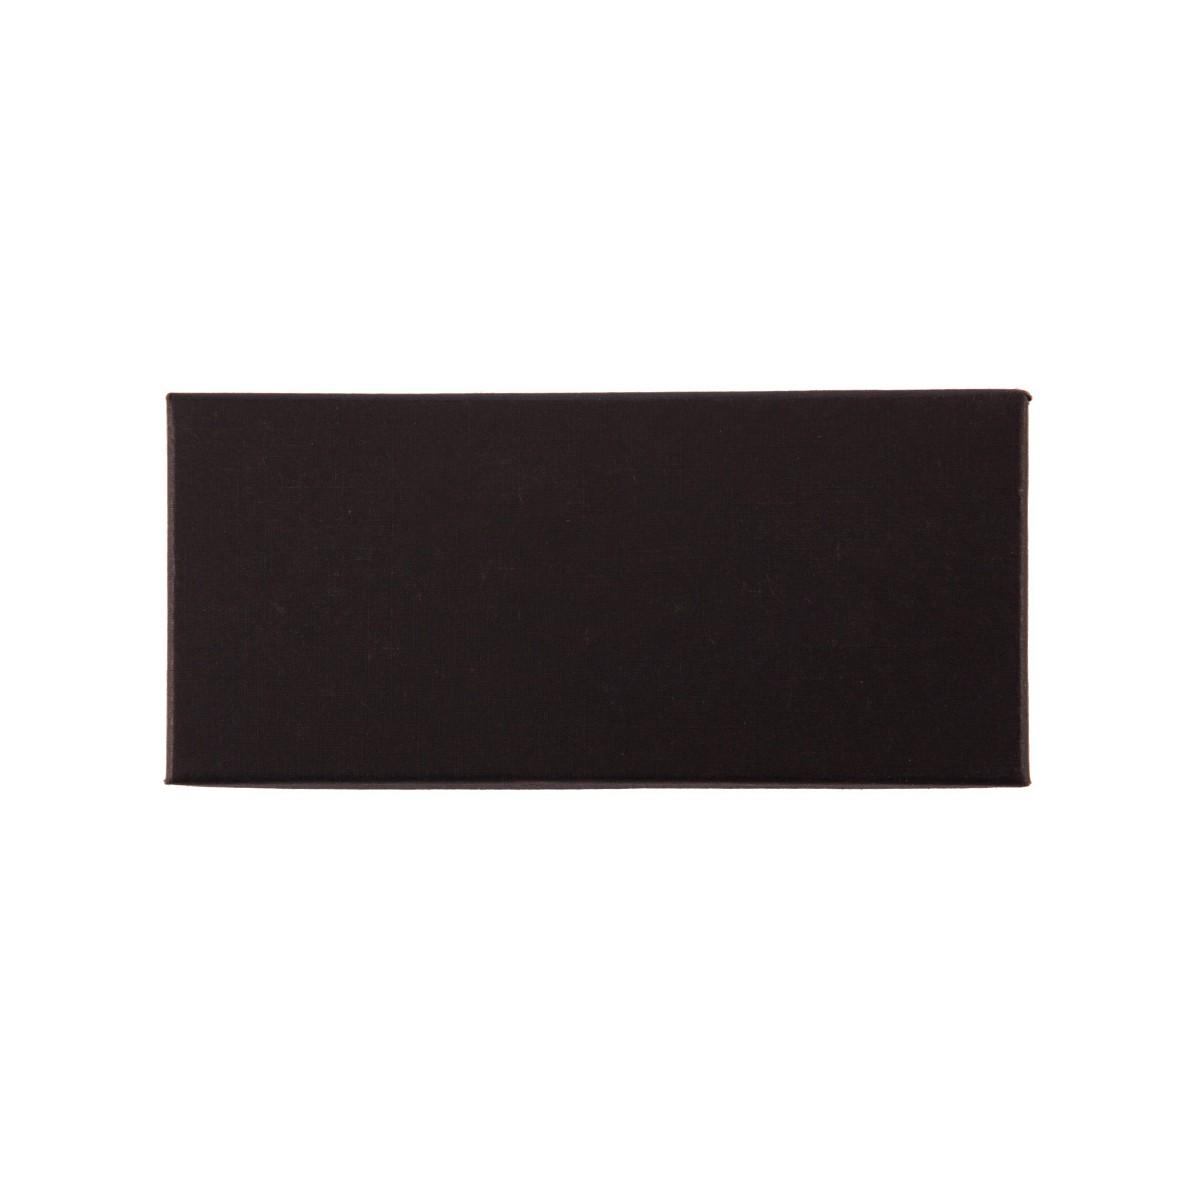 Pudełko 990016-1C(ok.6,5x14,5x2,5cm)